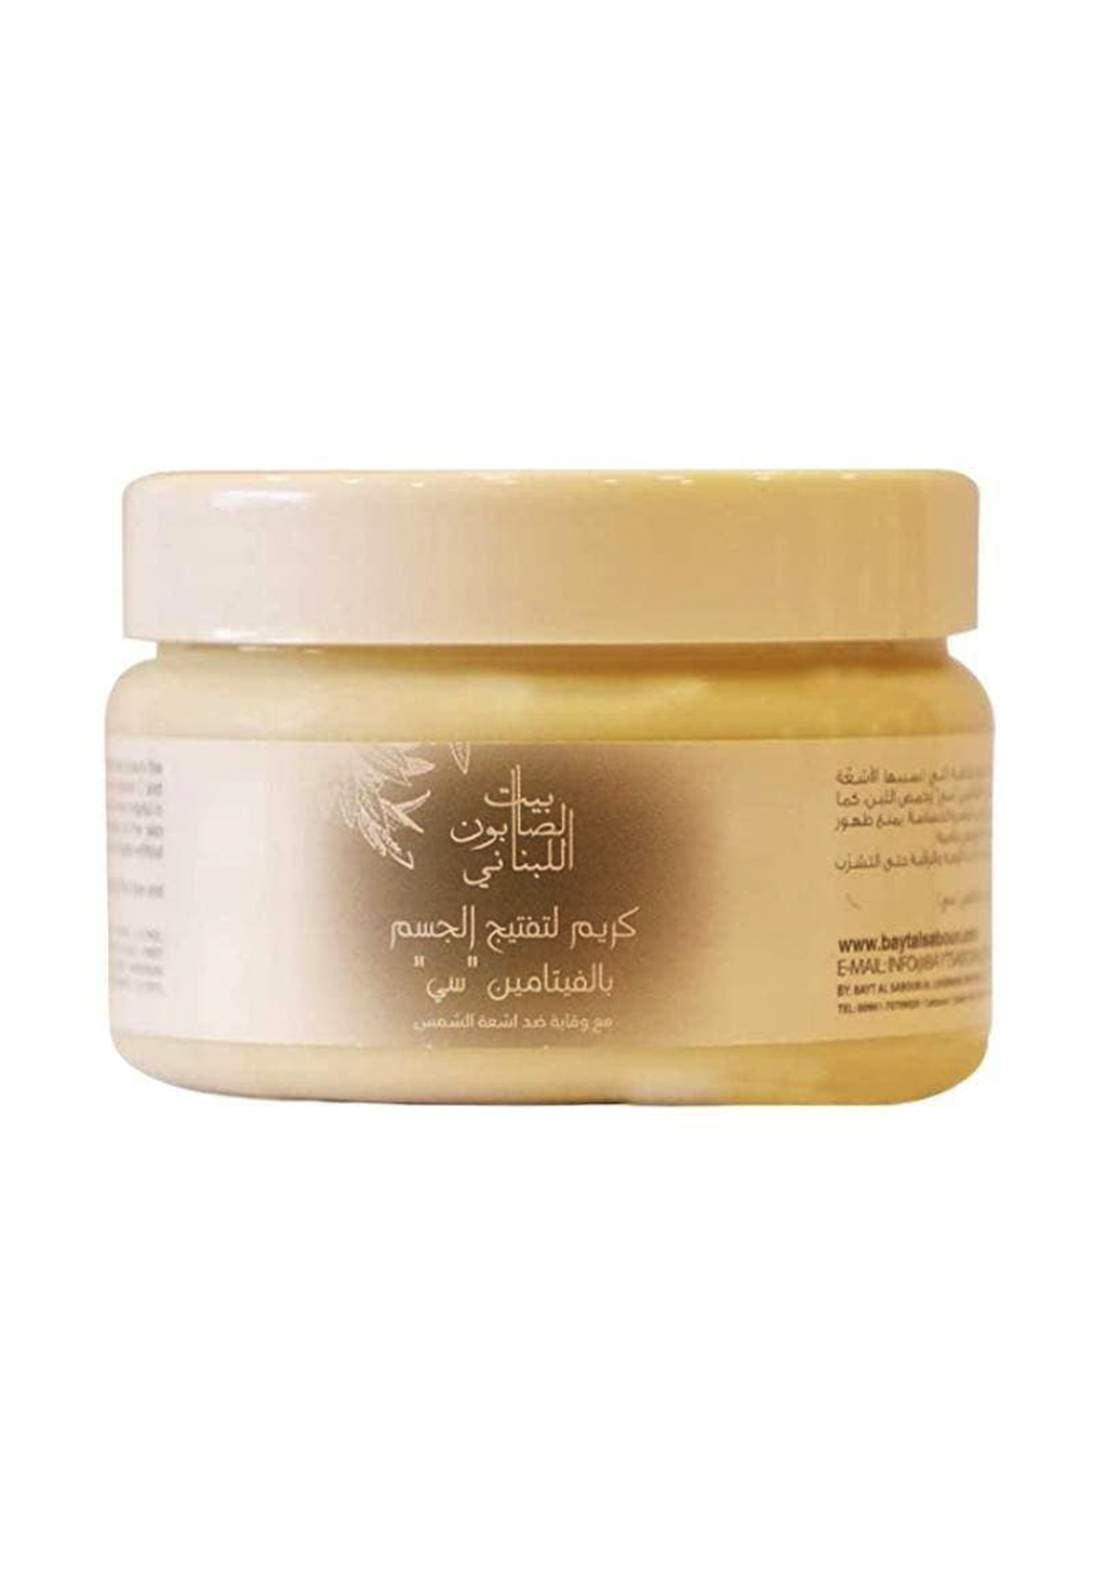 "Bayt Alsaboun Alloubnani-317452 Whitening Body Cream Vitamin ""C"" 300g كريم"